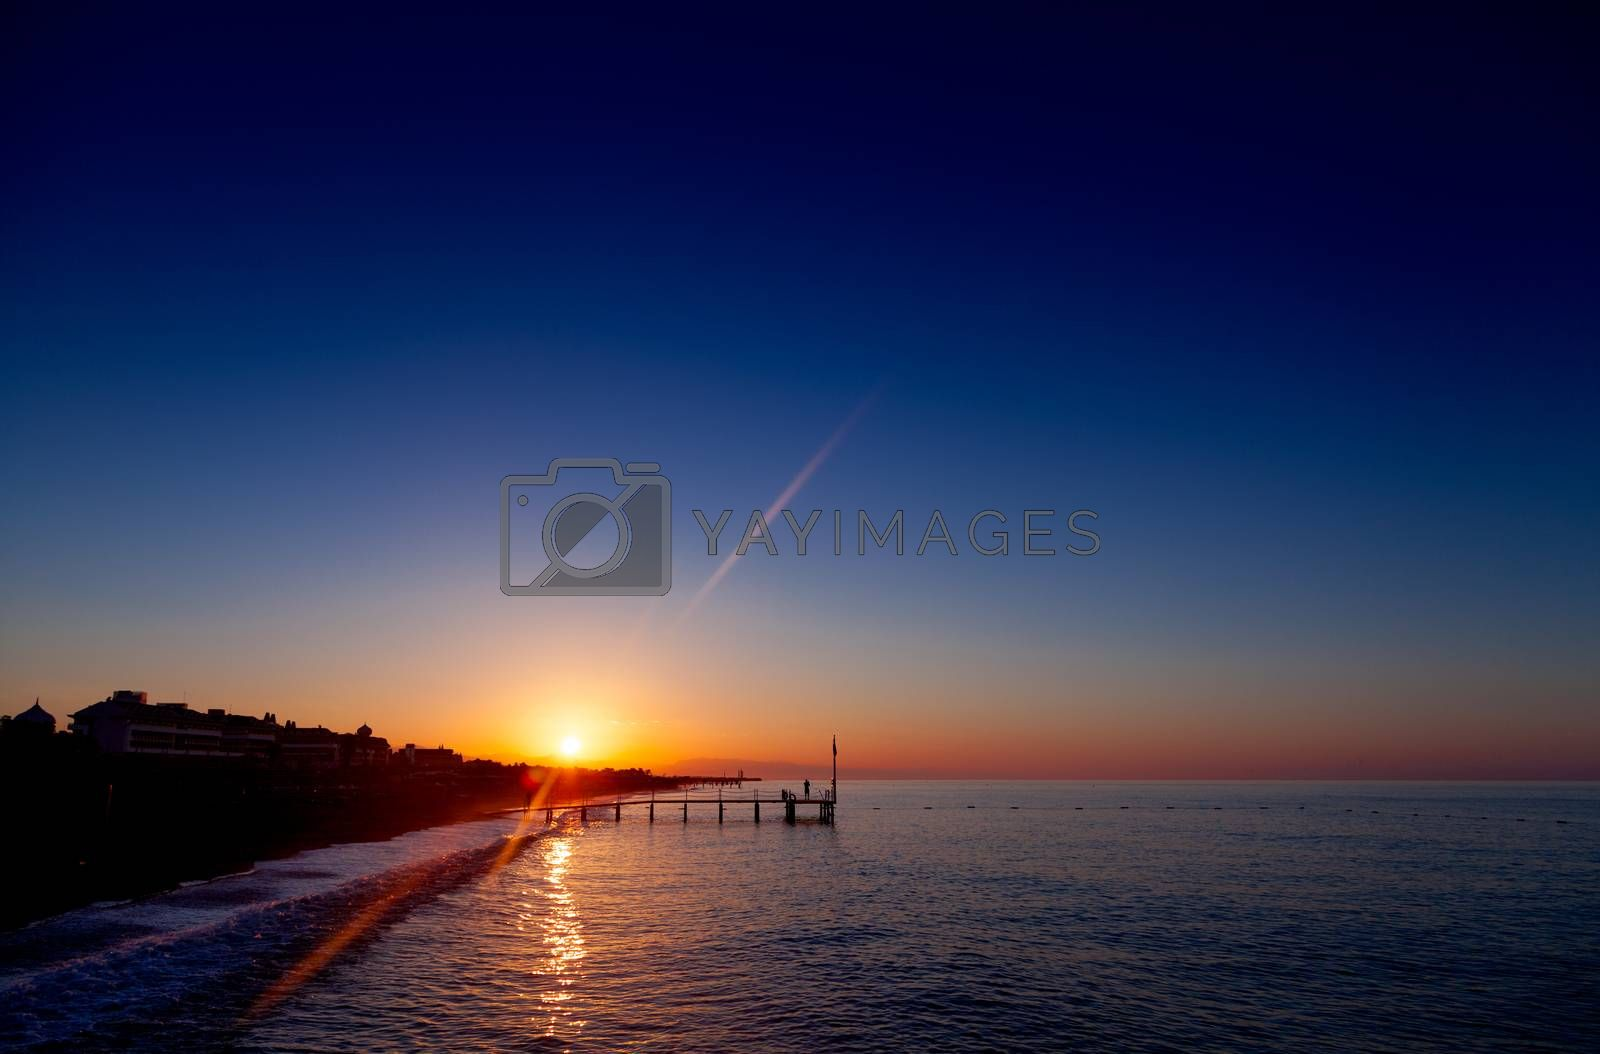 Colorful dawn over the sea in tropic location